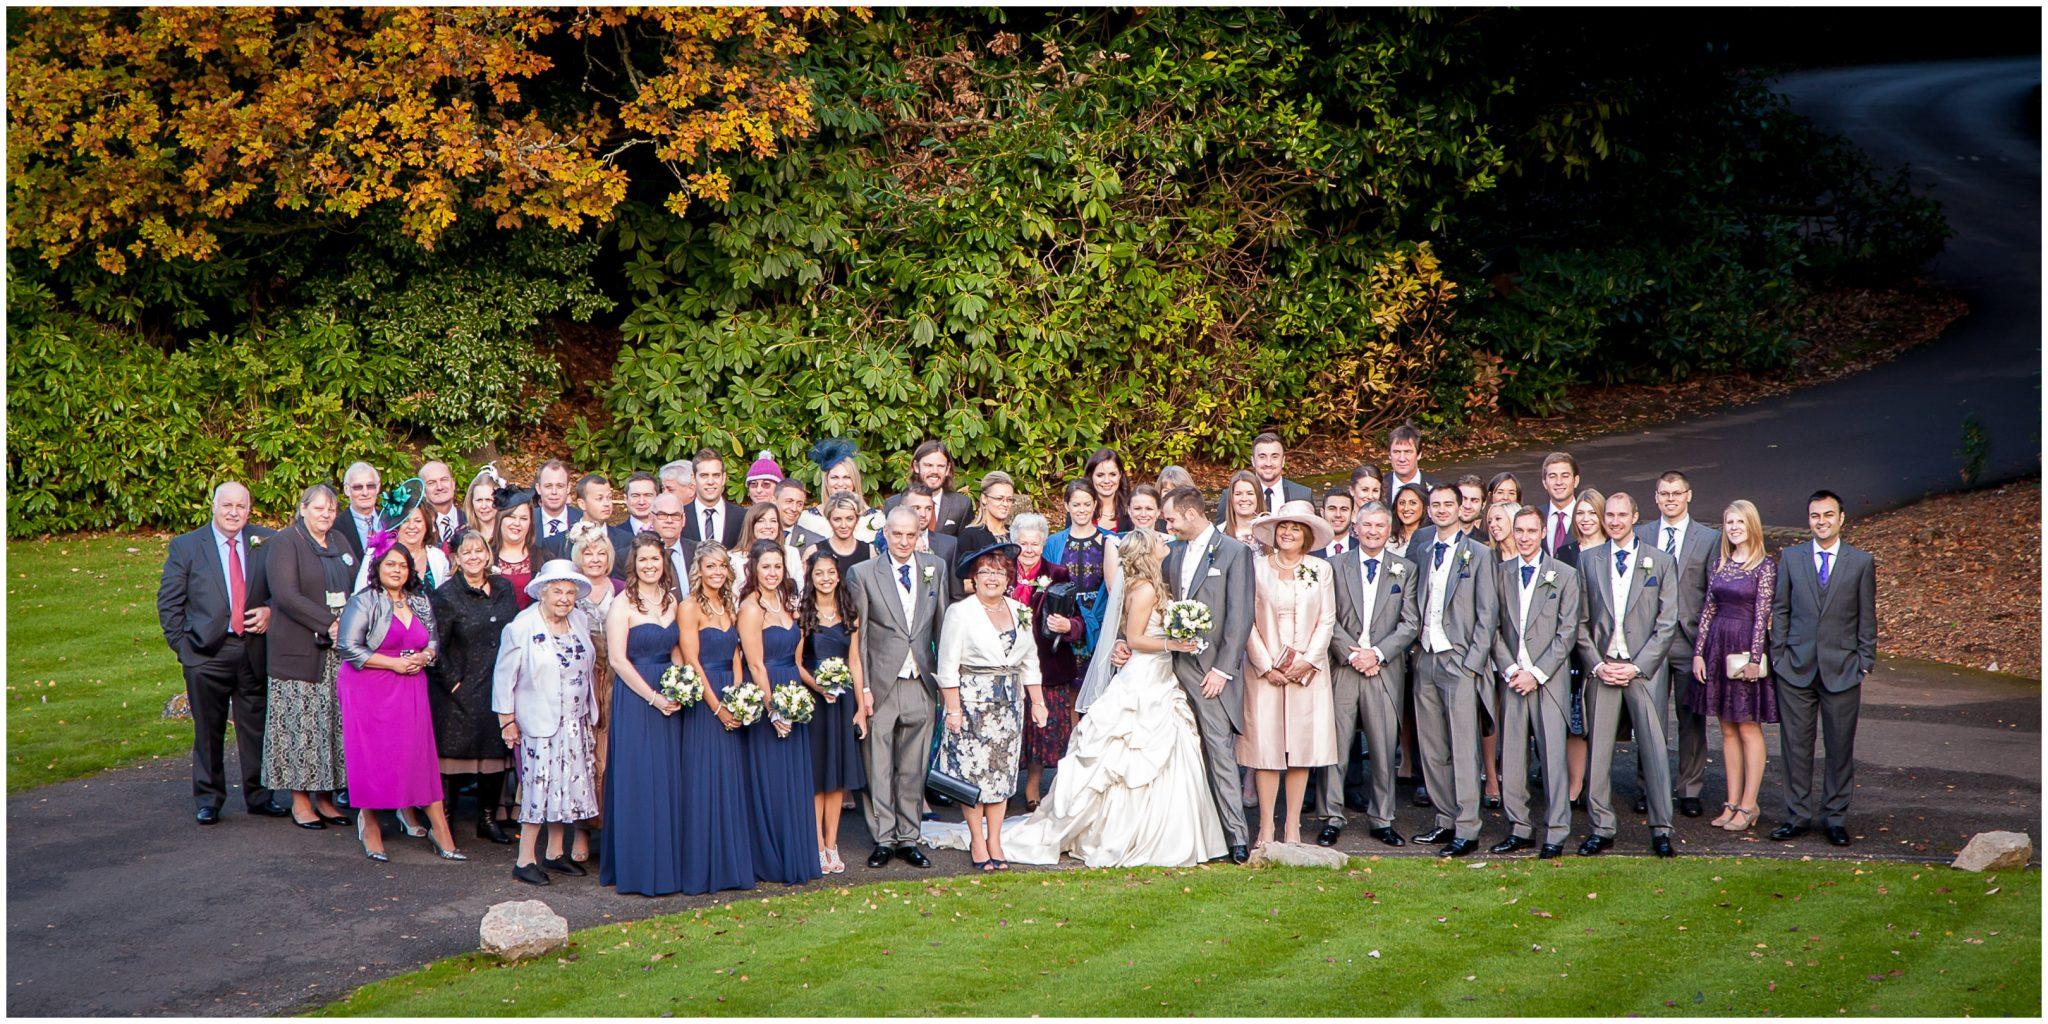 Audleys Wood wedding photography large group photo on driveway